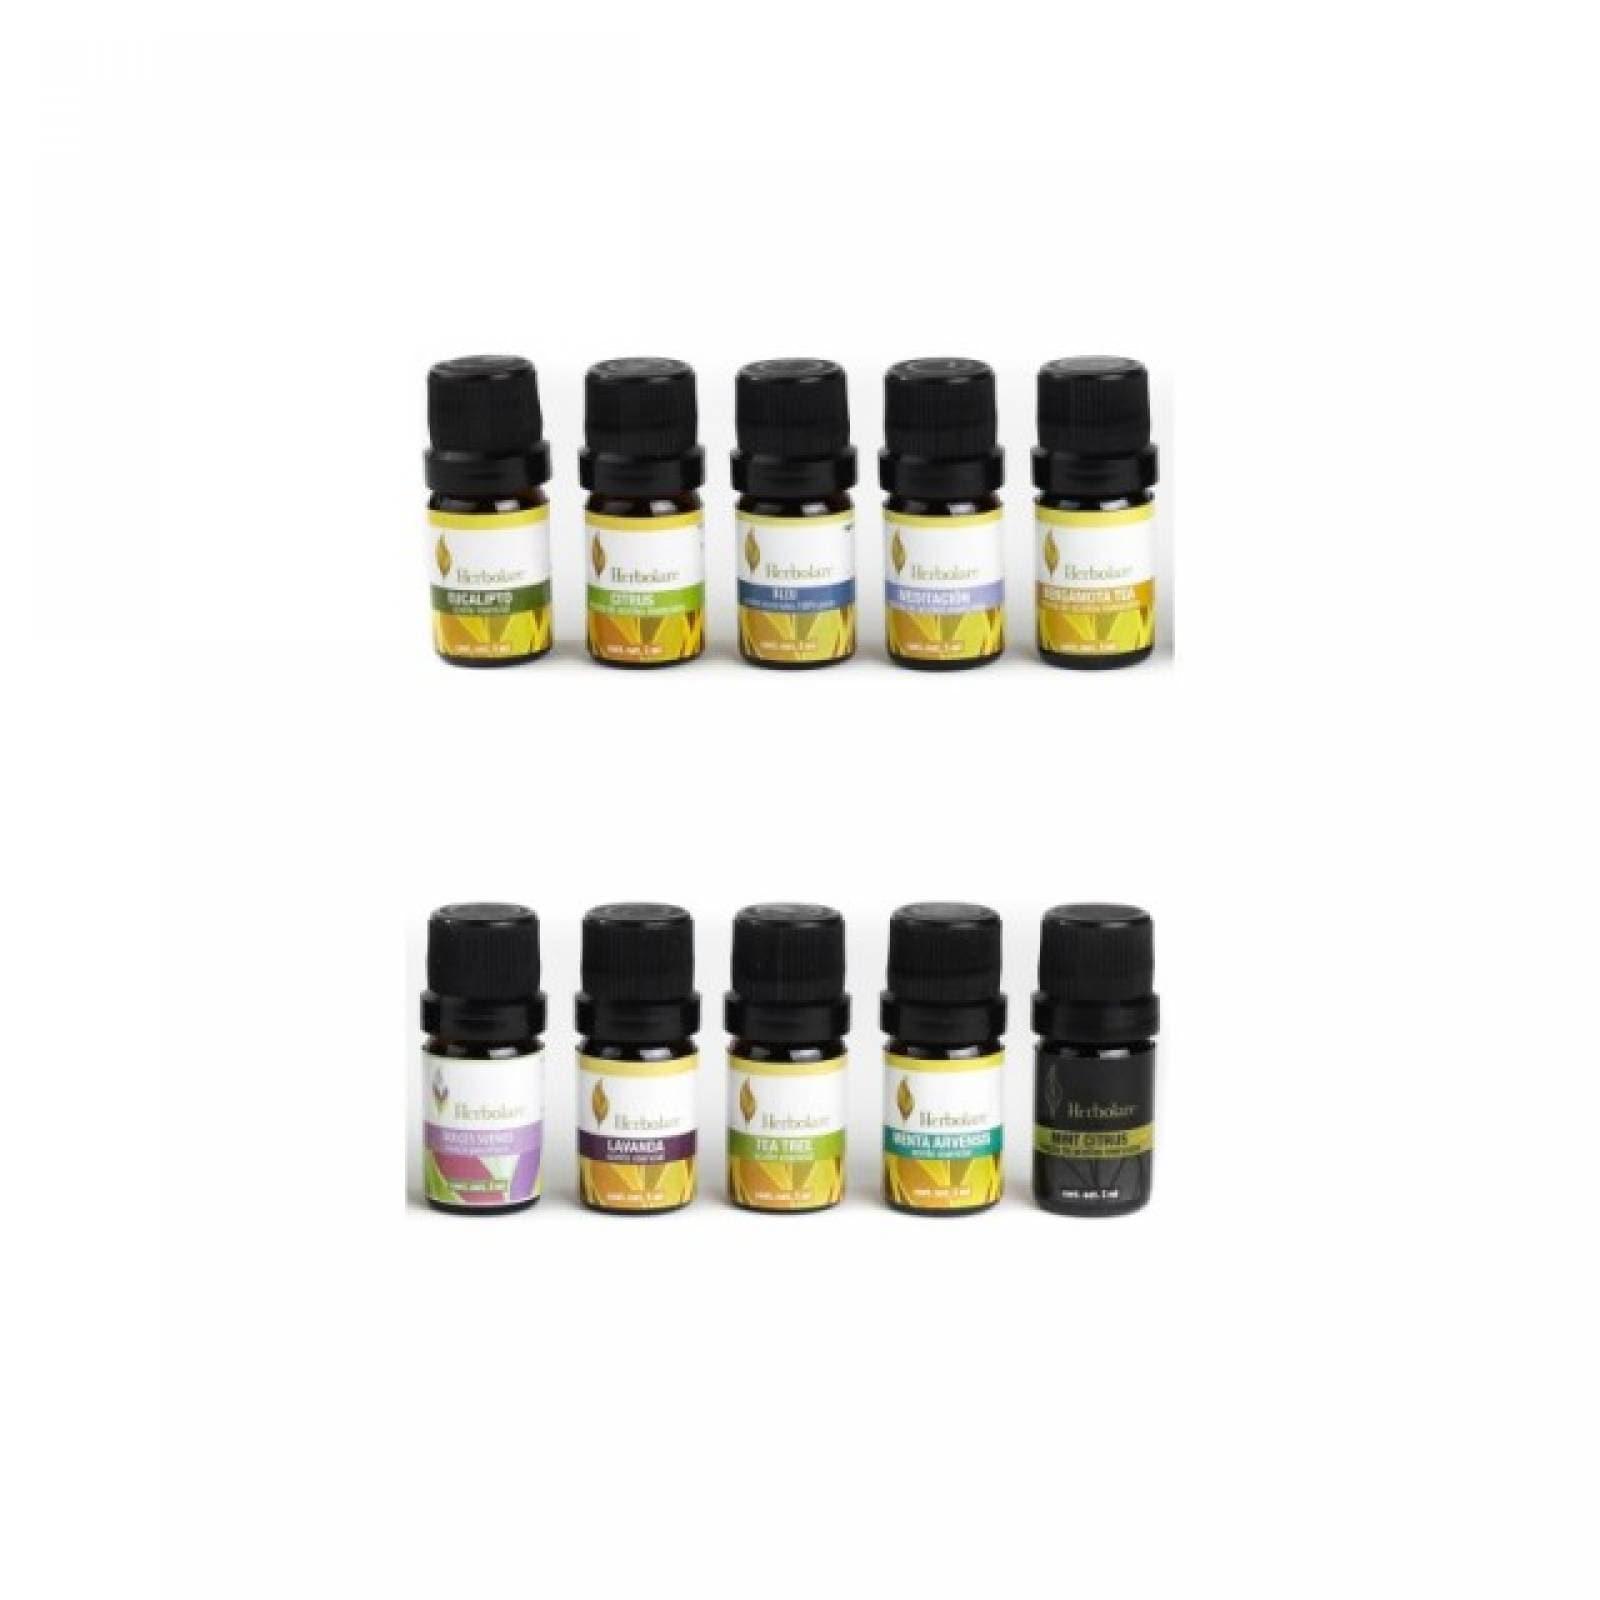 Kit 10 Aceites Escenciales 5ml Aromaterapia Herbolare